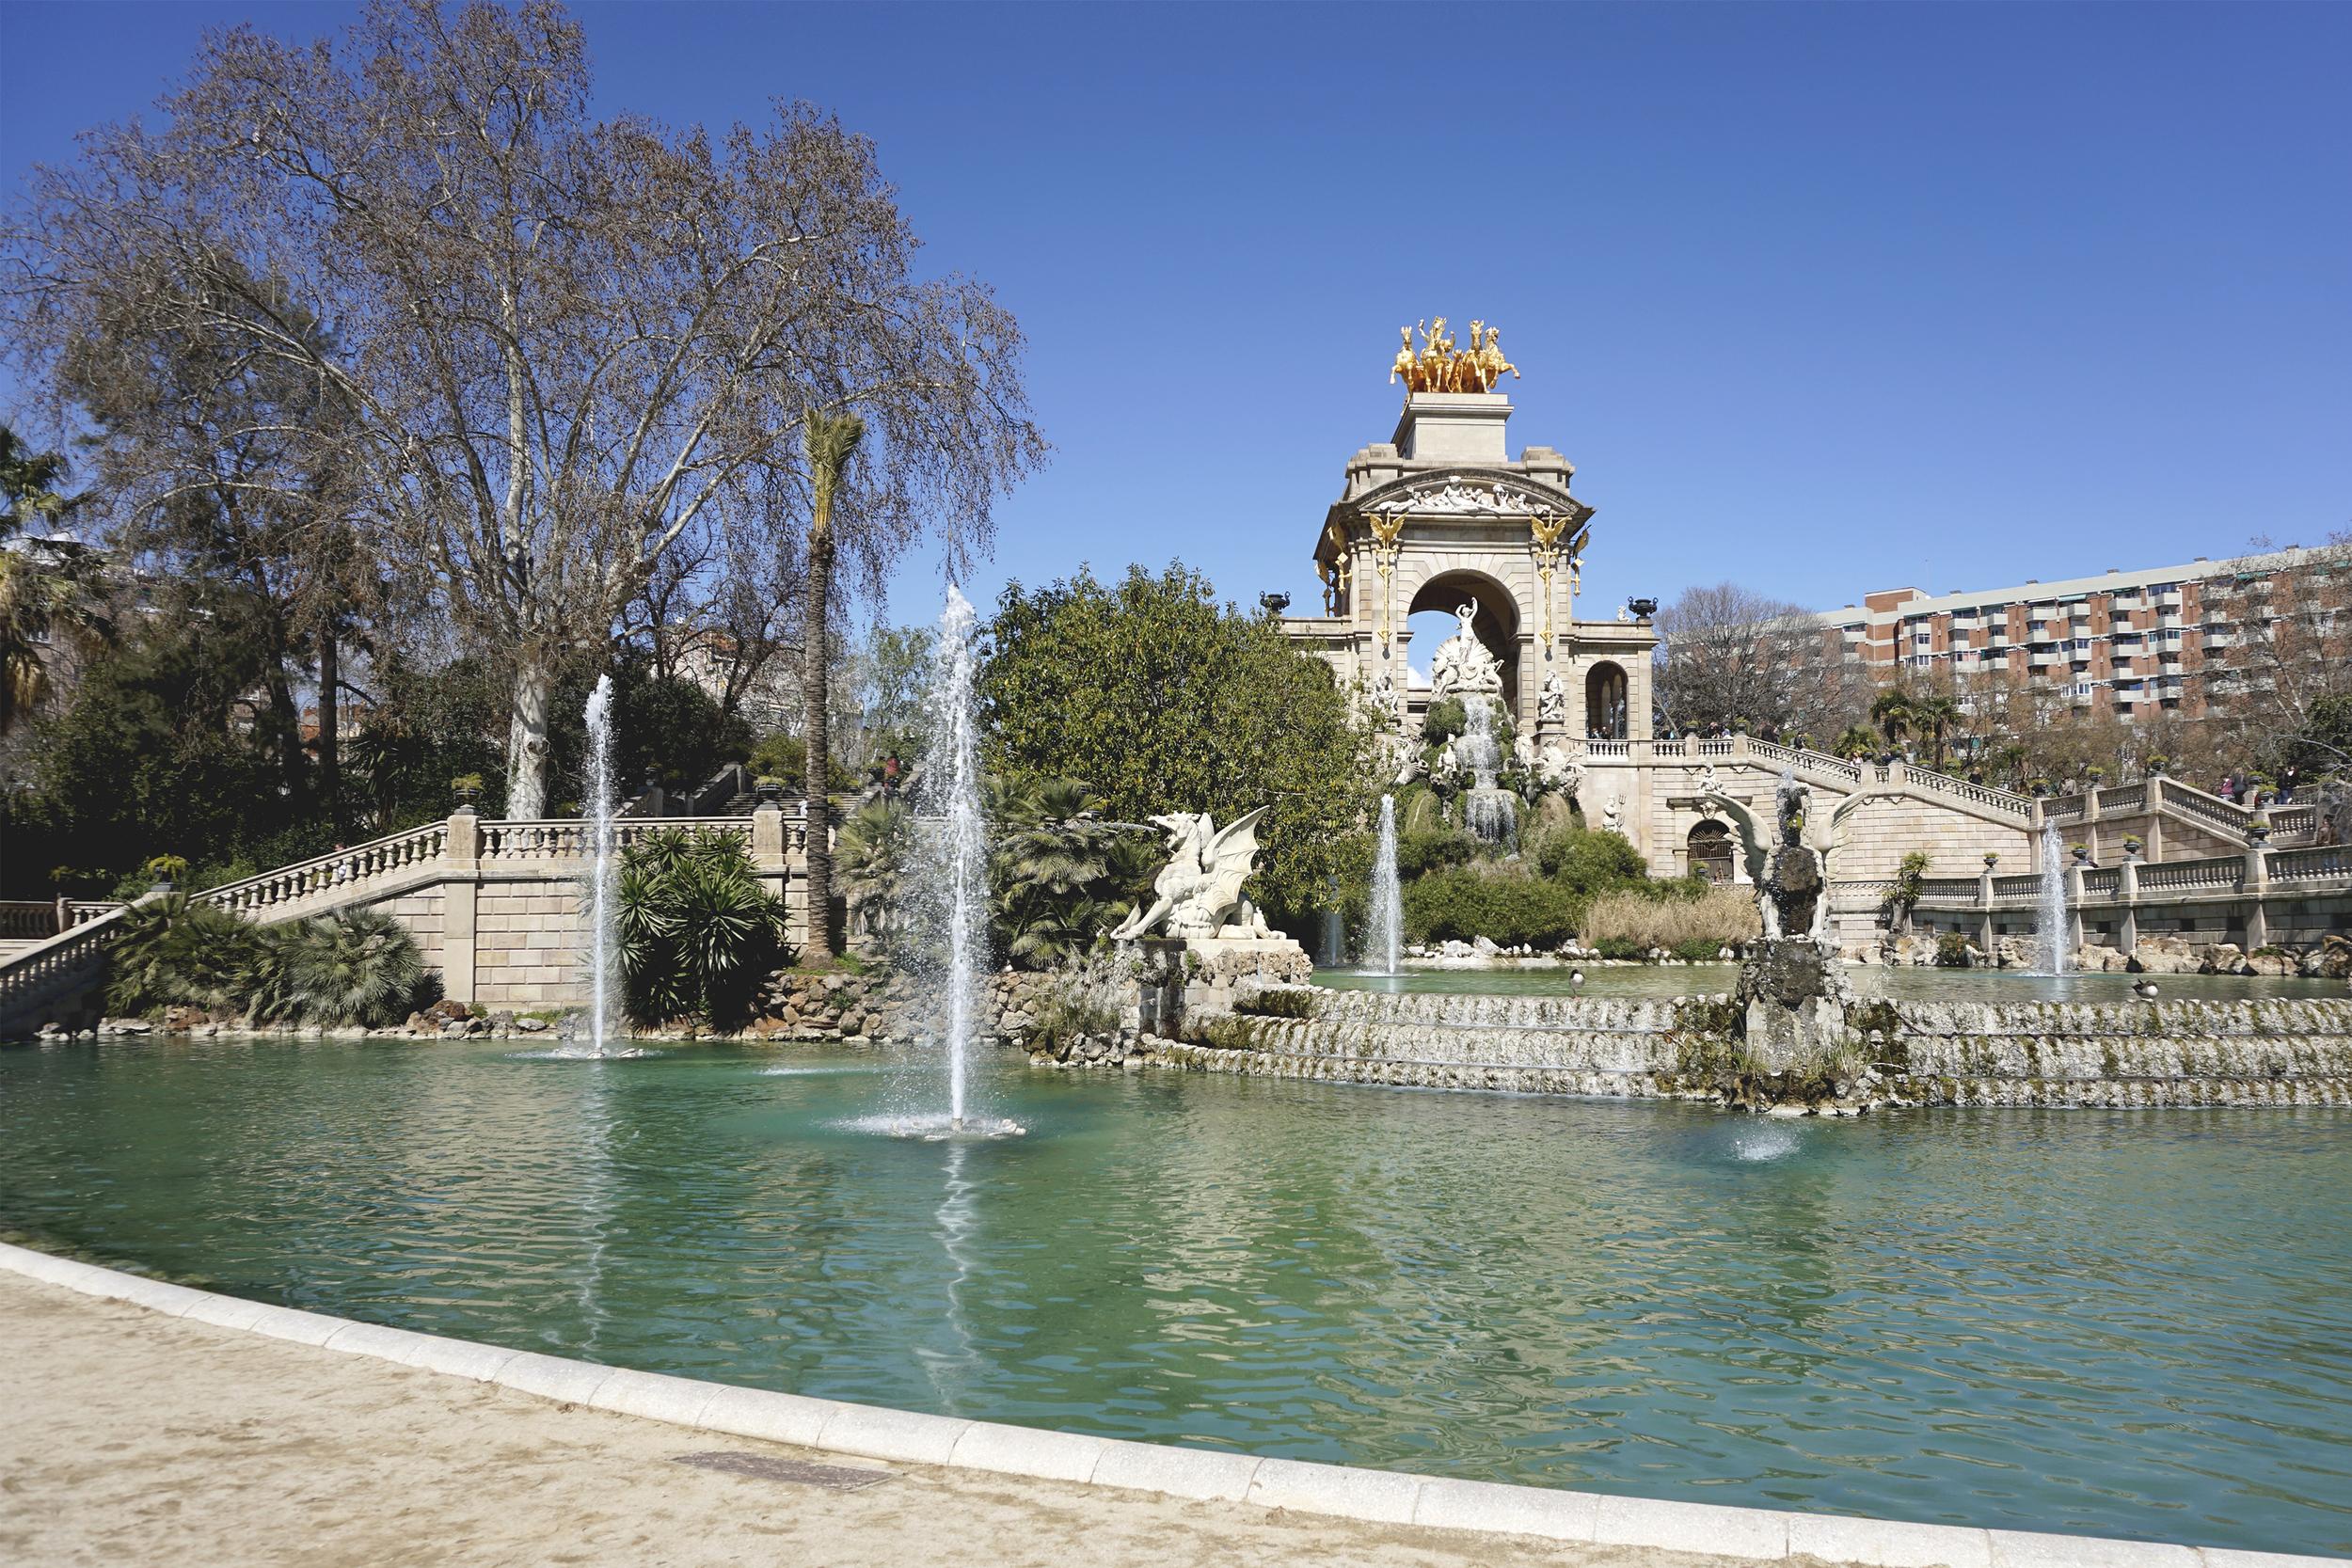 Cascada Monumental, Parc de la Ciutadella, Barcelona, Spain